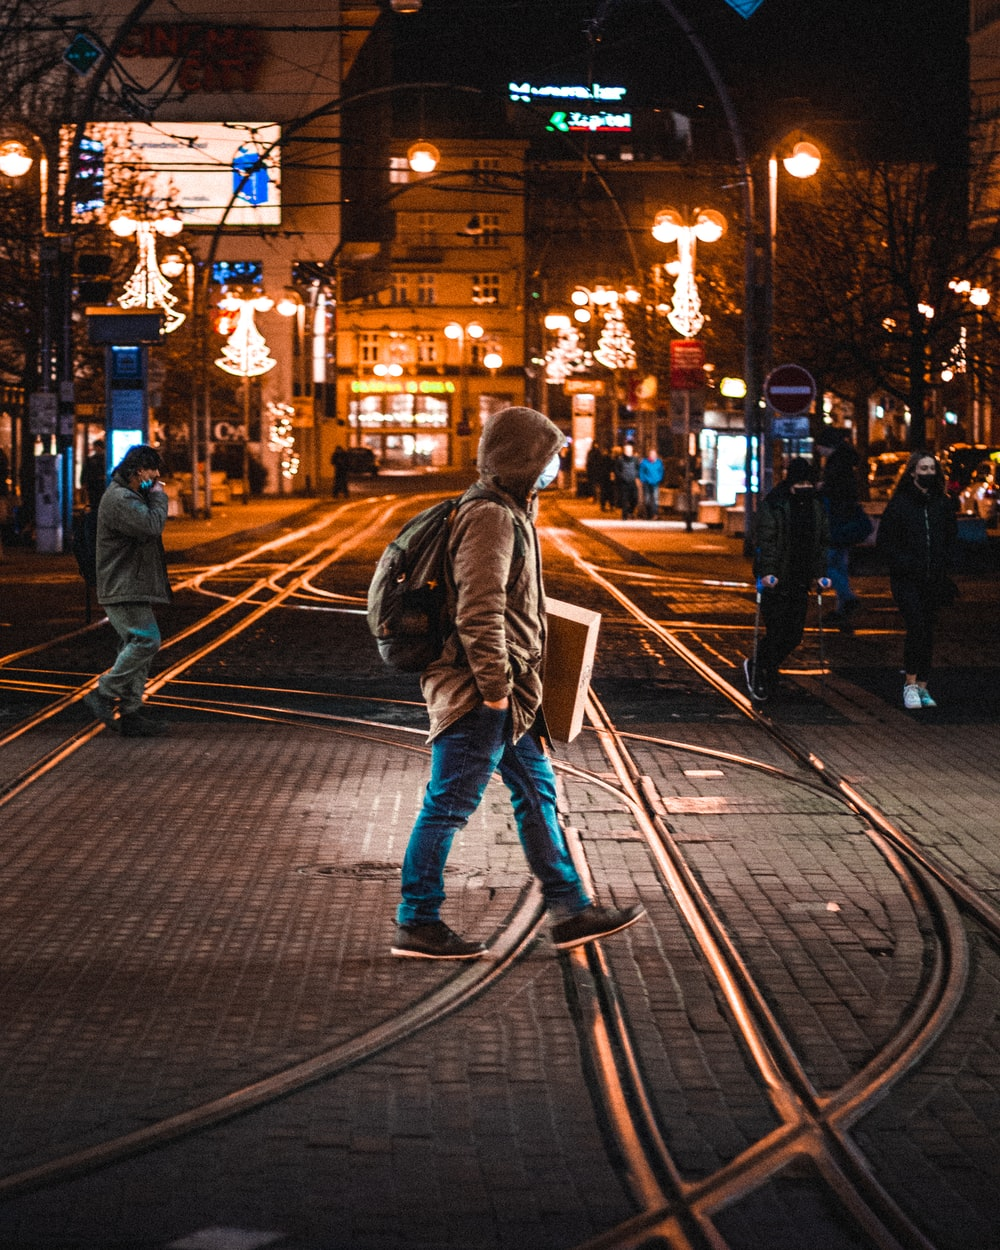 woman in gray jacket walking on sidewalk during night time